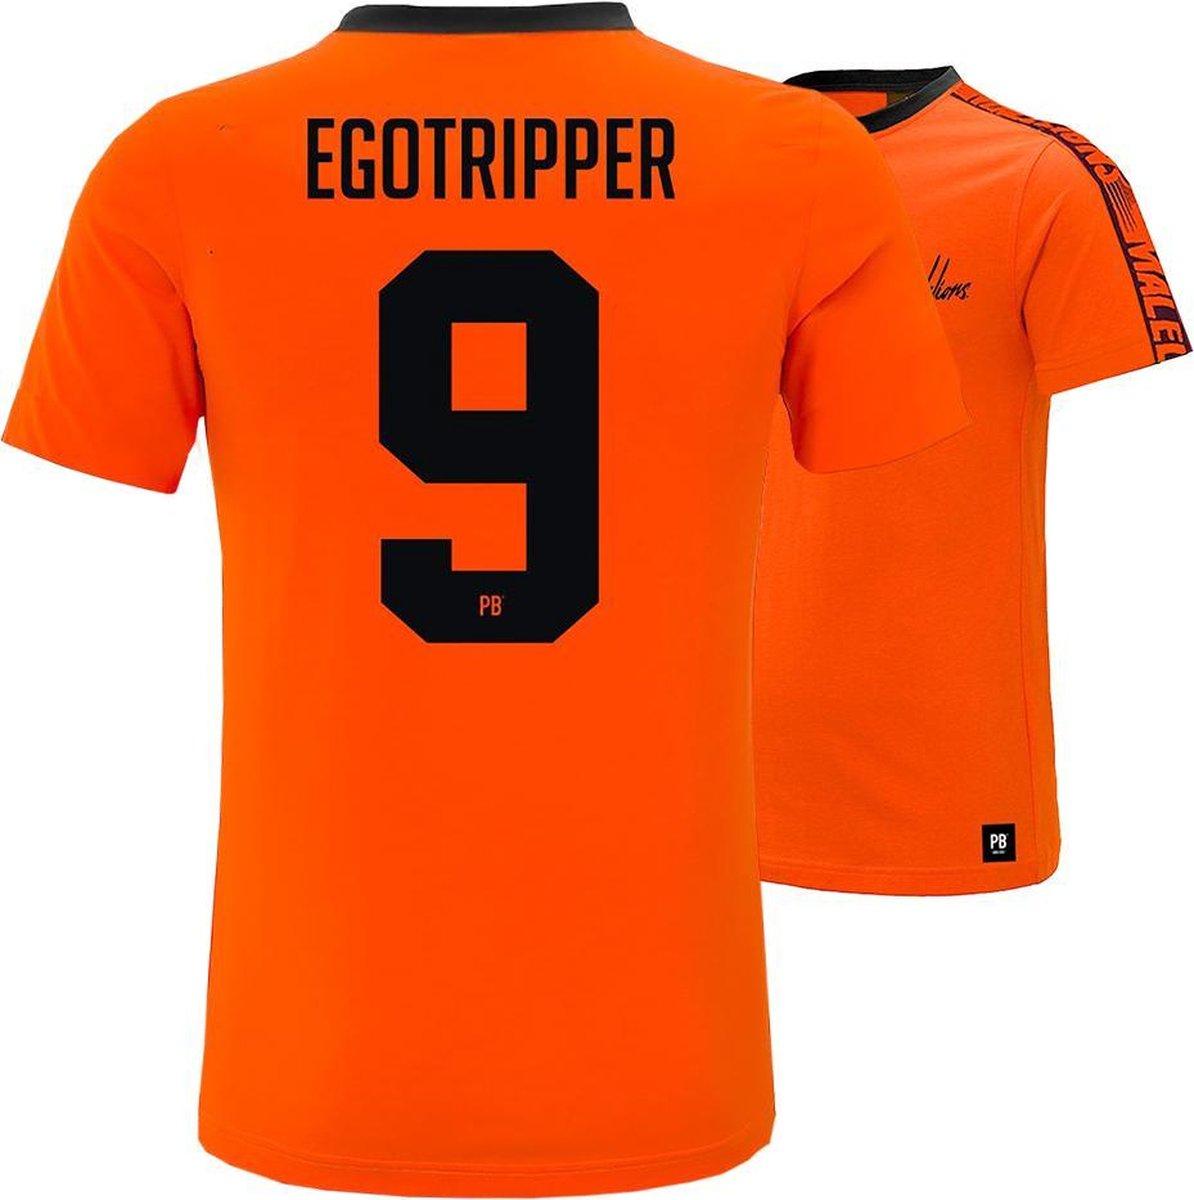 PB x Malelions - 9. Egotripper   Maat L   Oranje T-shirt   EK voetbal 2021   Heren en dames